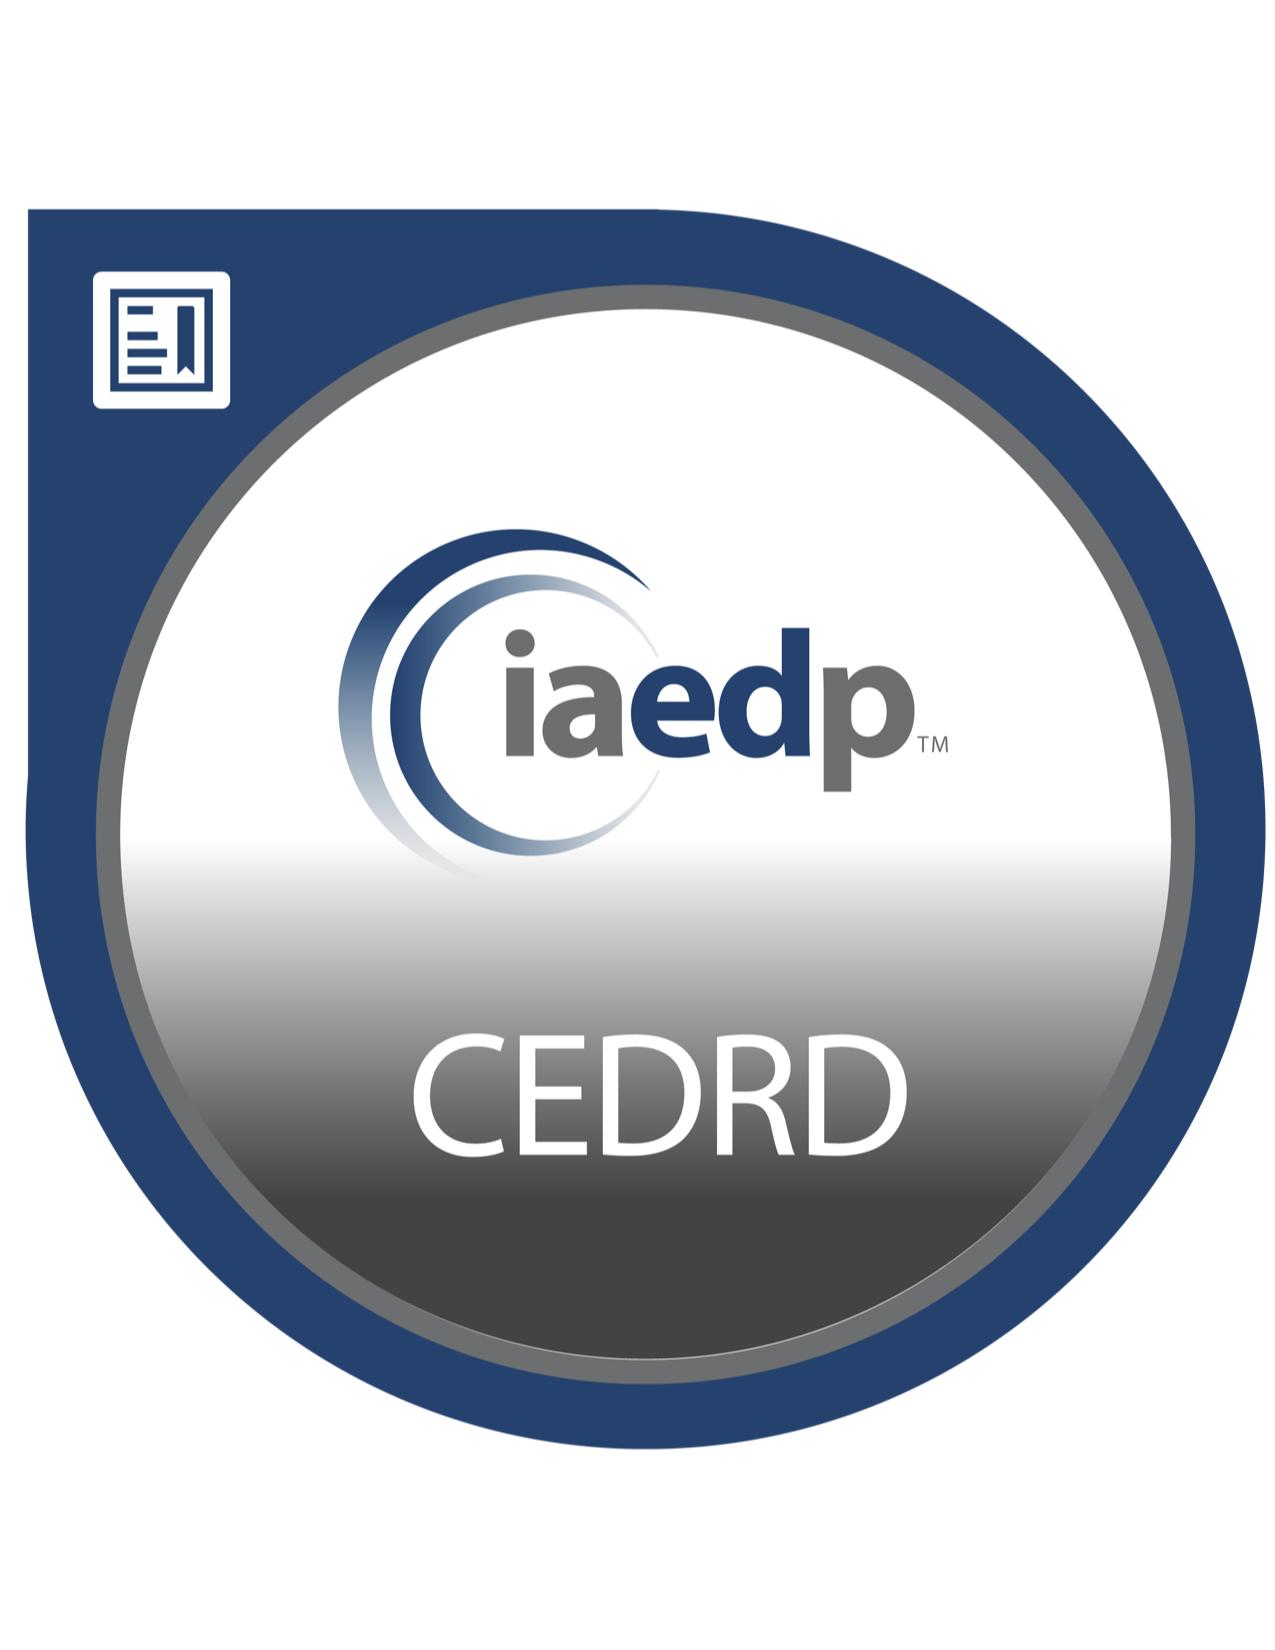 CEDRD badge